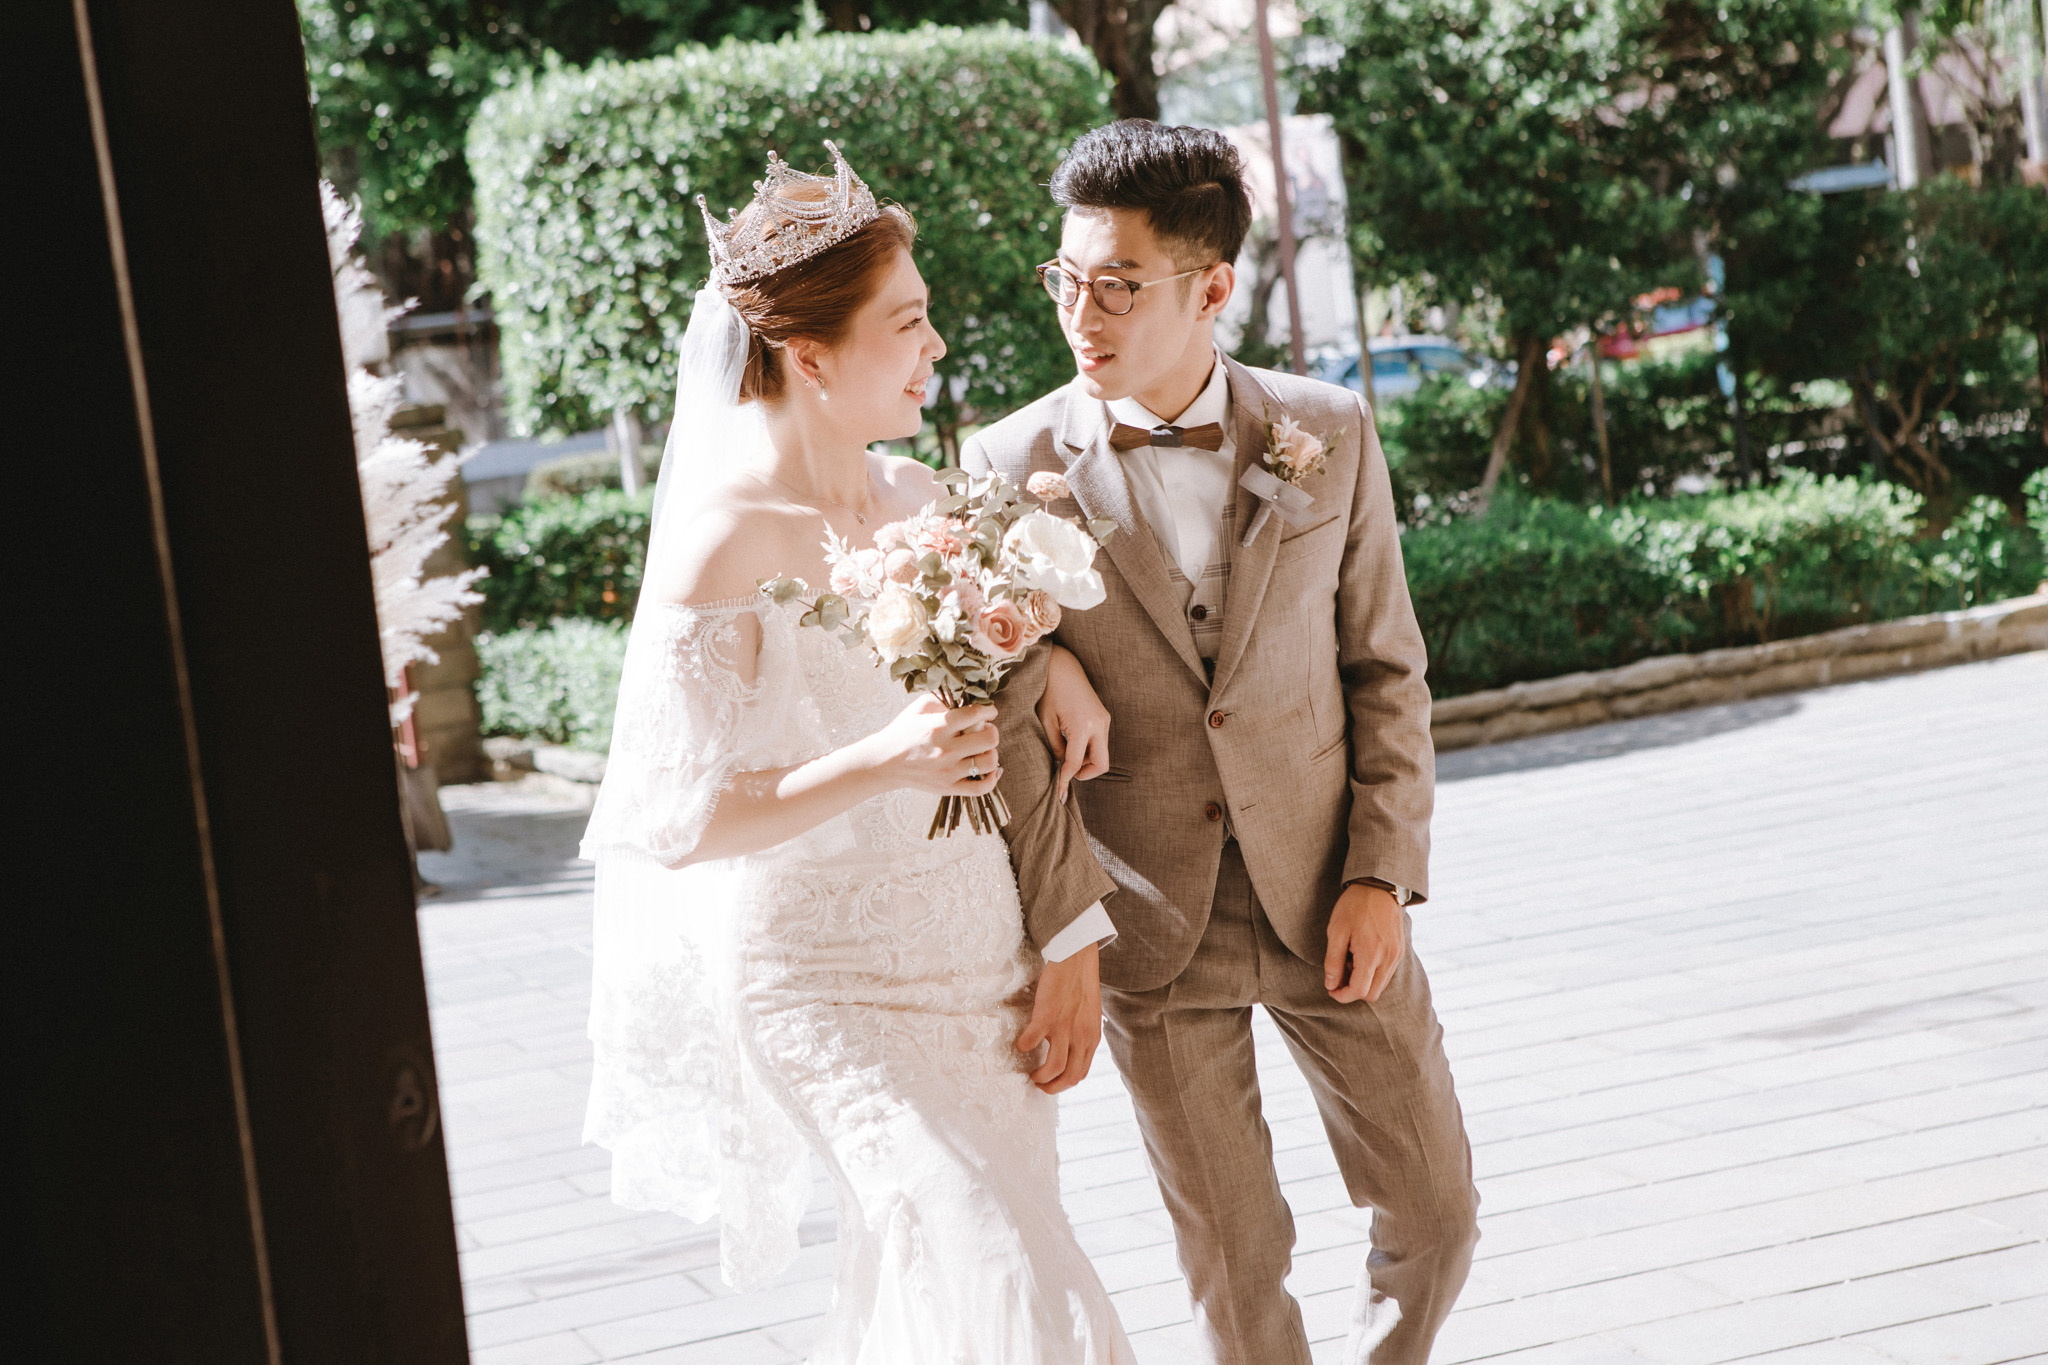 EW 台北婚攝 居米 濟南教會 Brick Yard 33 美軍俱樂部 婚禮 婚宴-20